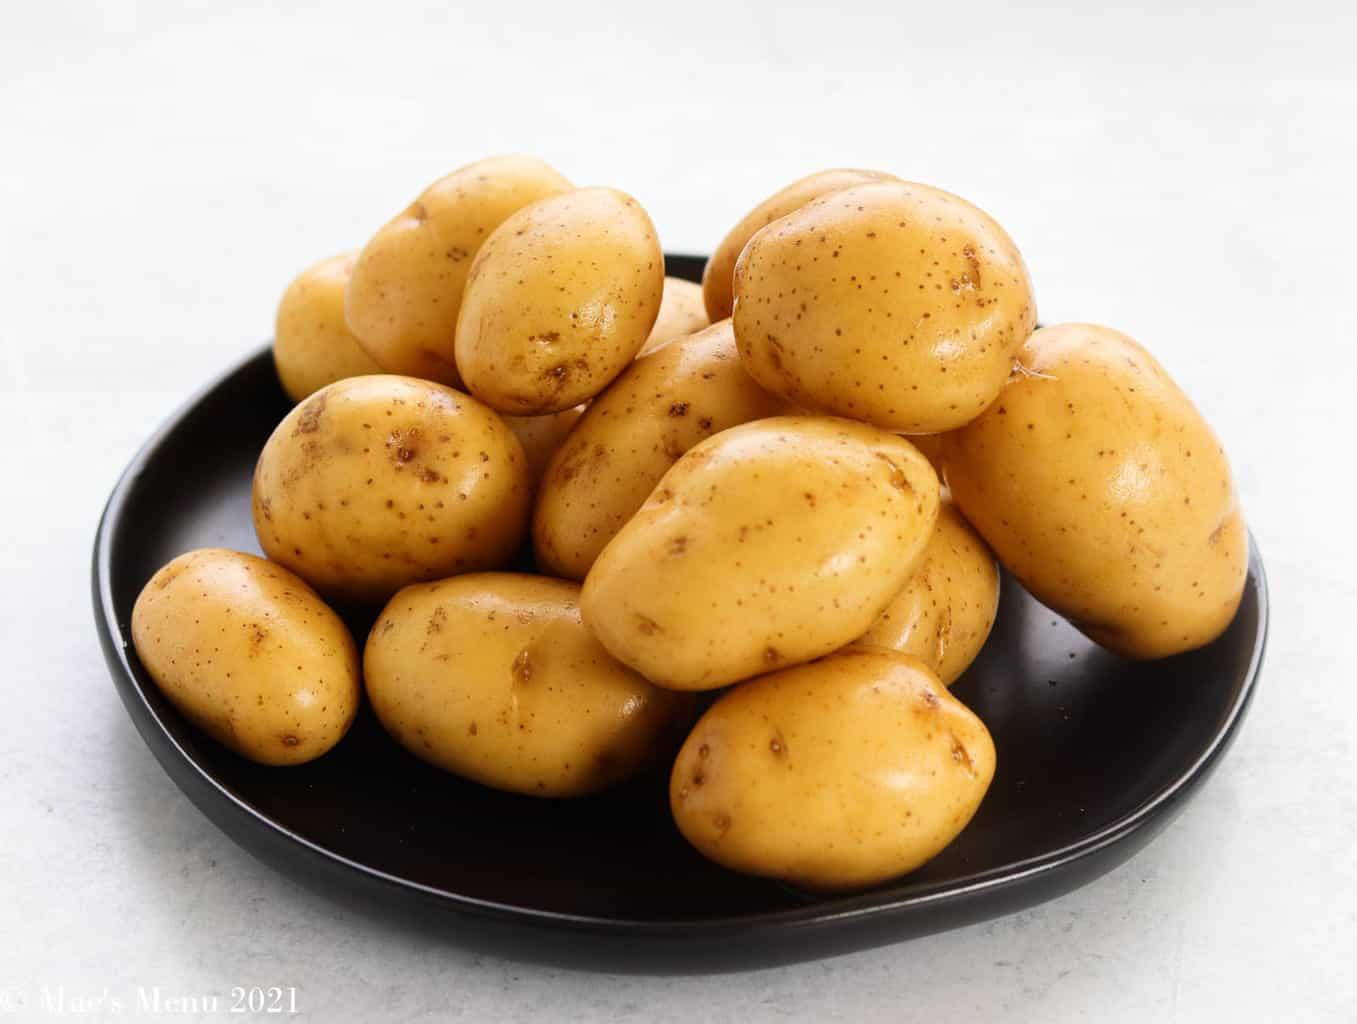 baby yukon gold potatoes on a plate